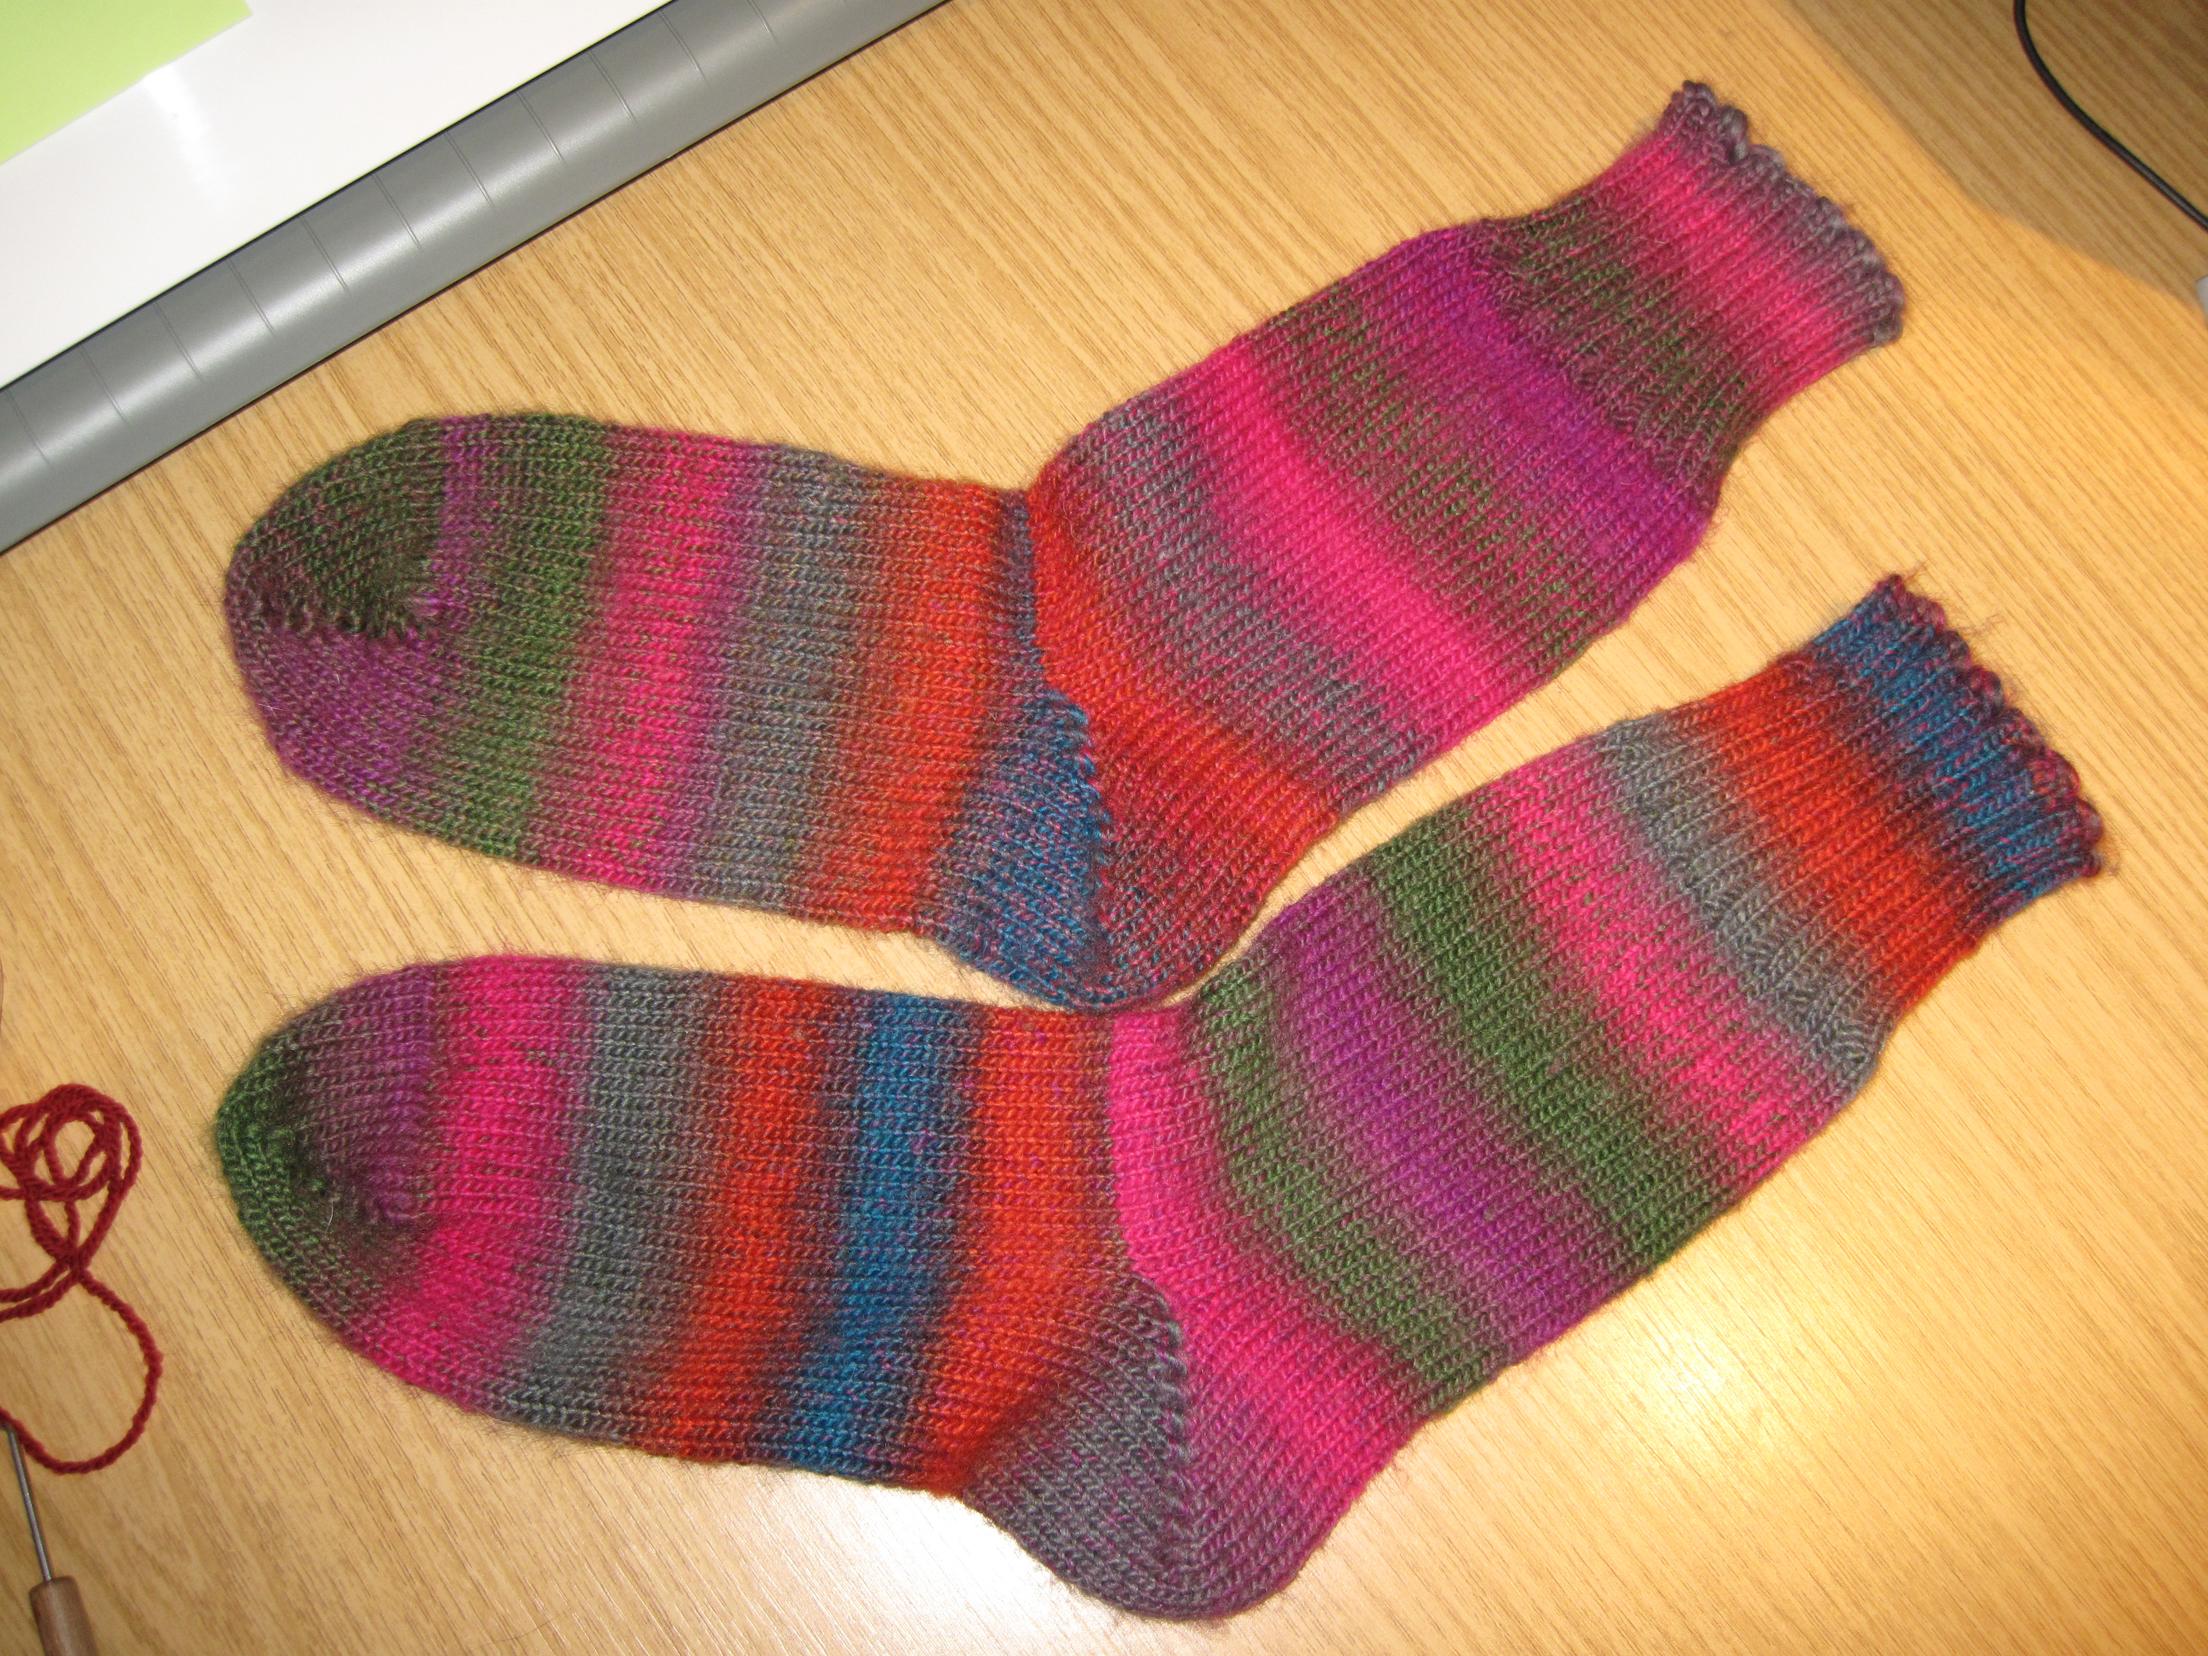 Knit Kitchener Stitch To Finish A Sock : toe up sock Lizzie Mayne